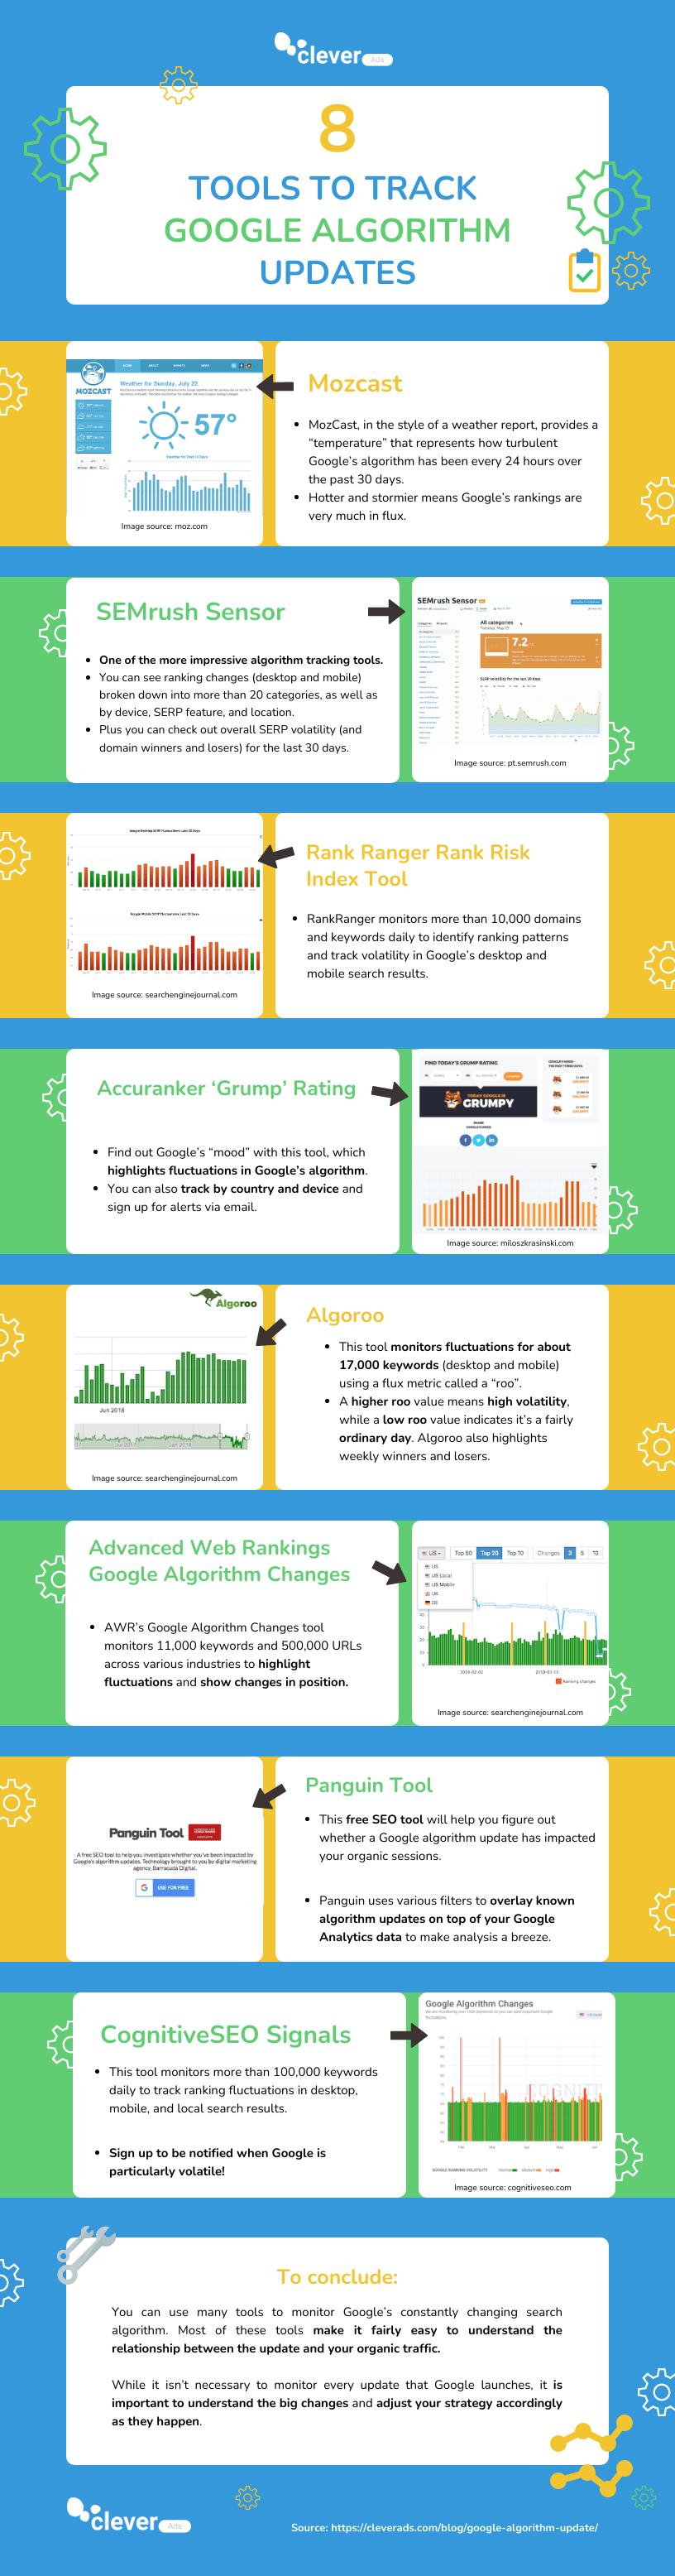 google algorithm update infographic